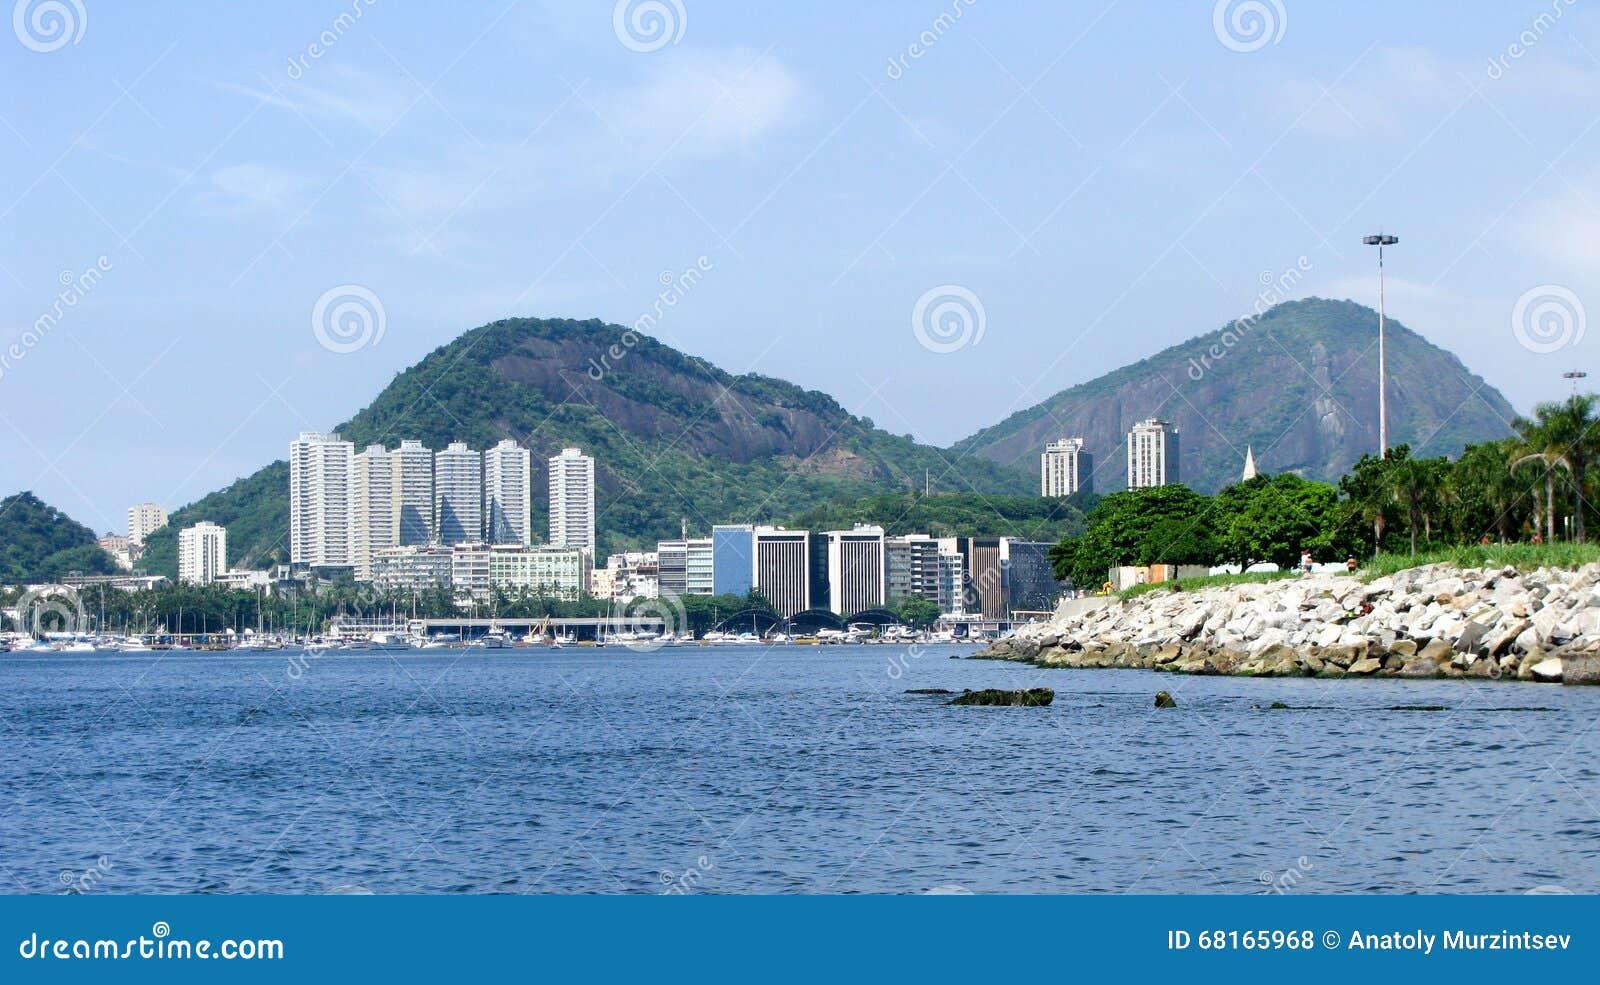 Spectacular panorama of Rio de Janeiro